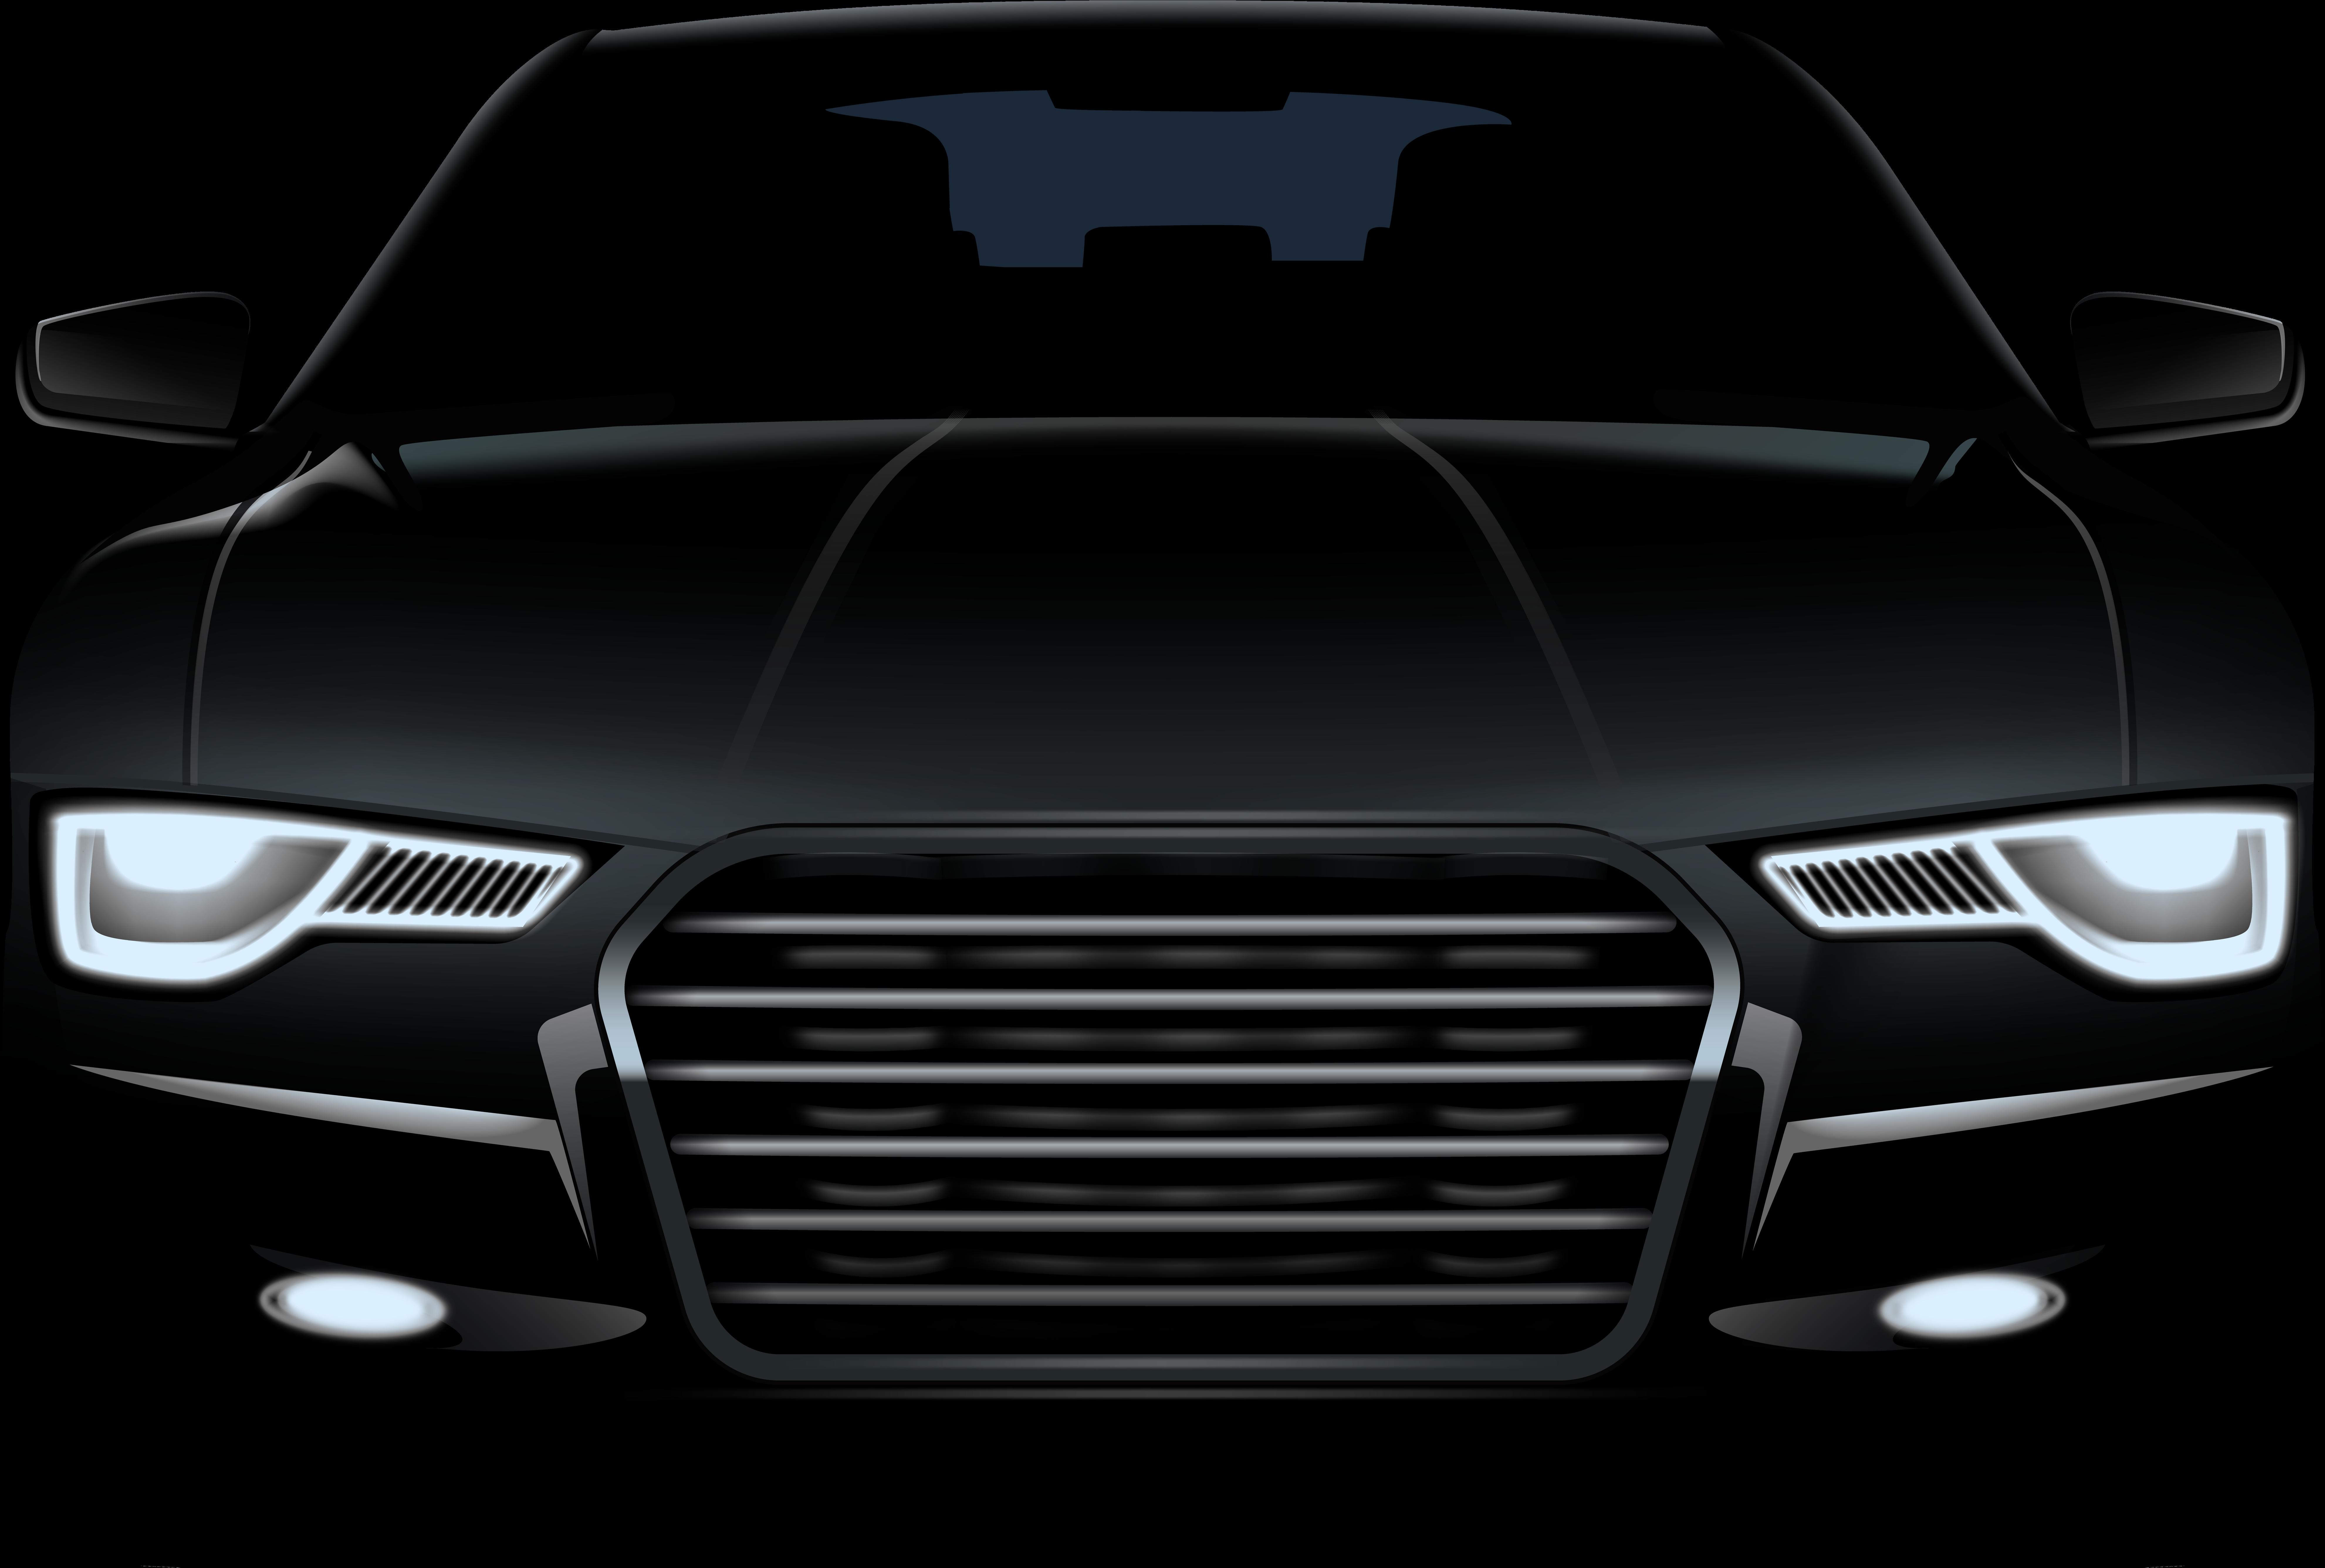 HD Car Front Png.